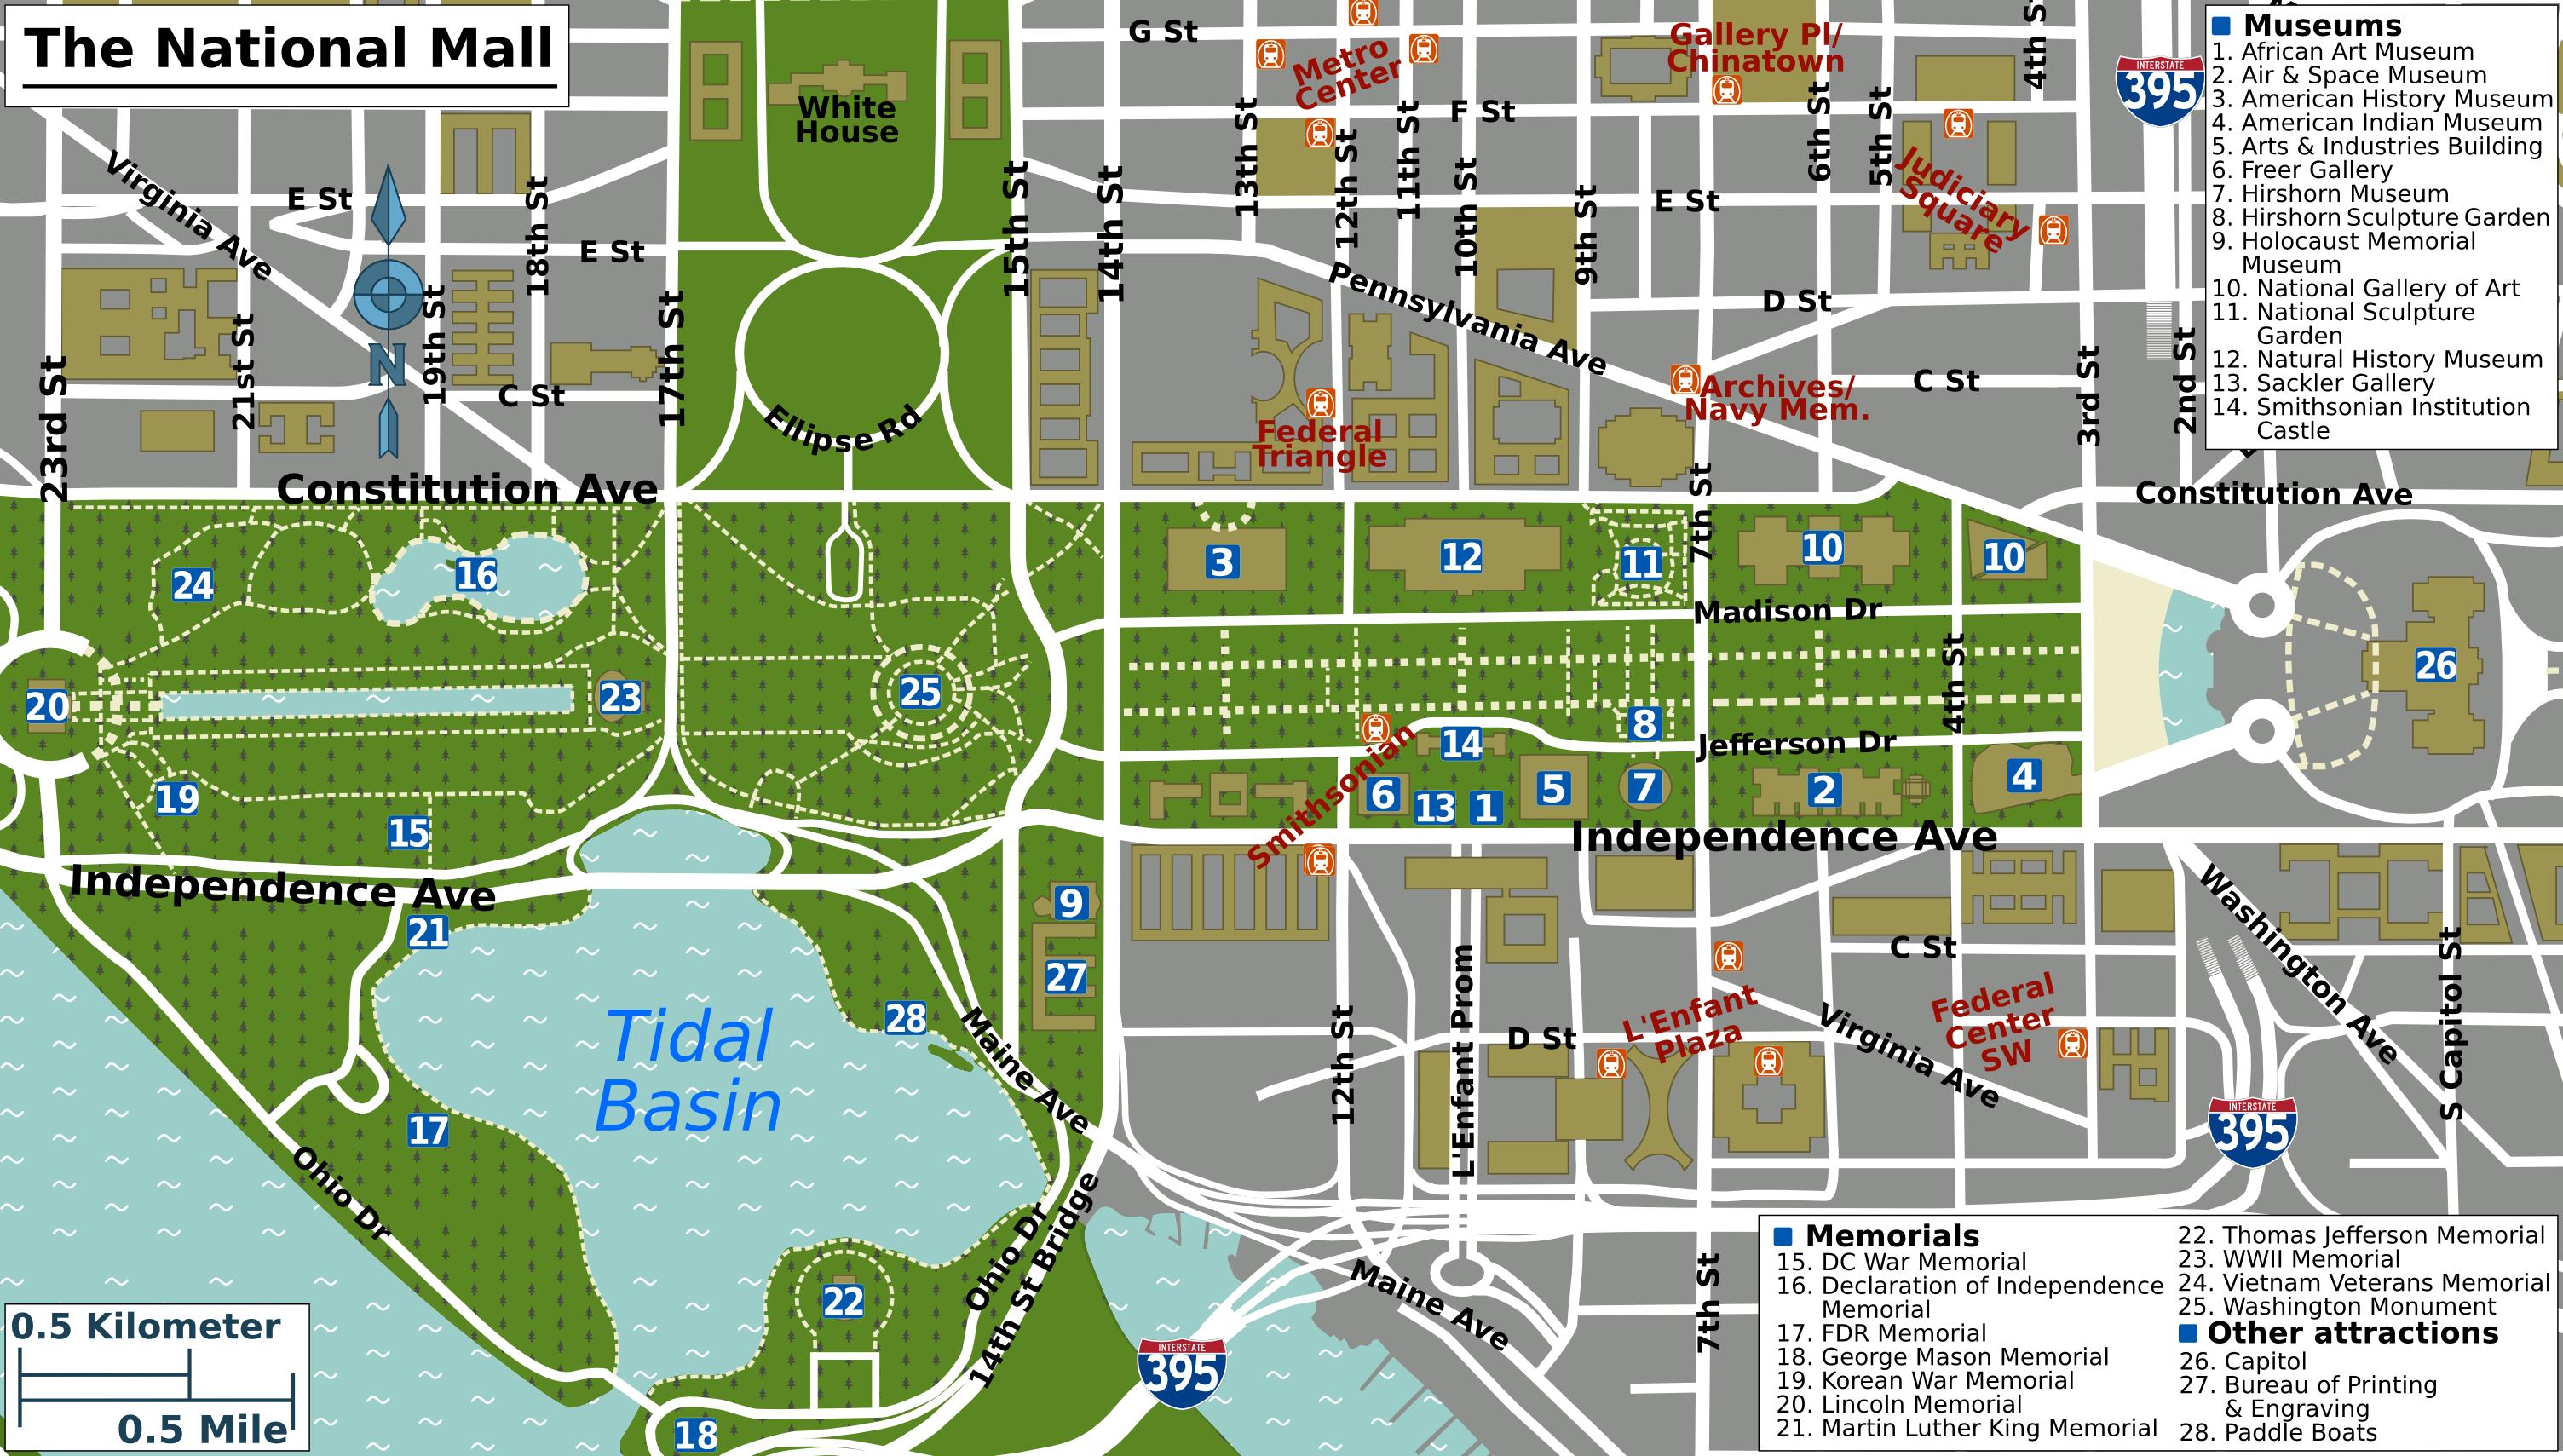 Magic image with regard to national mall map printable